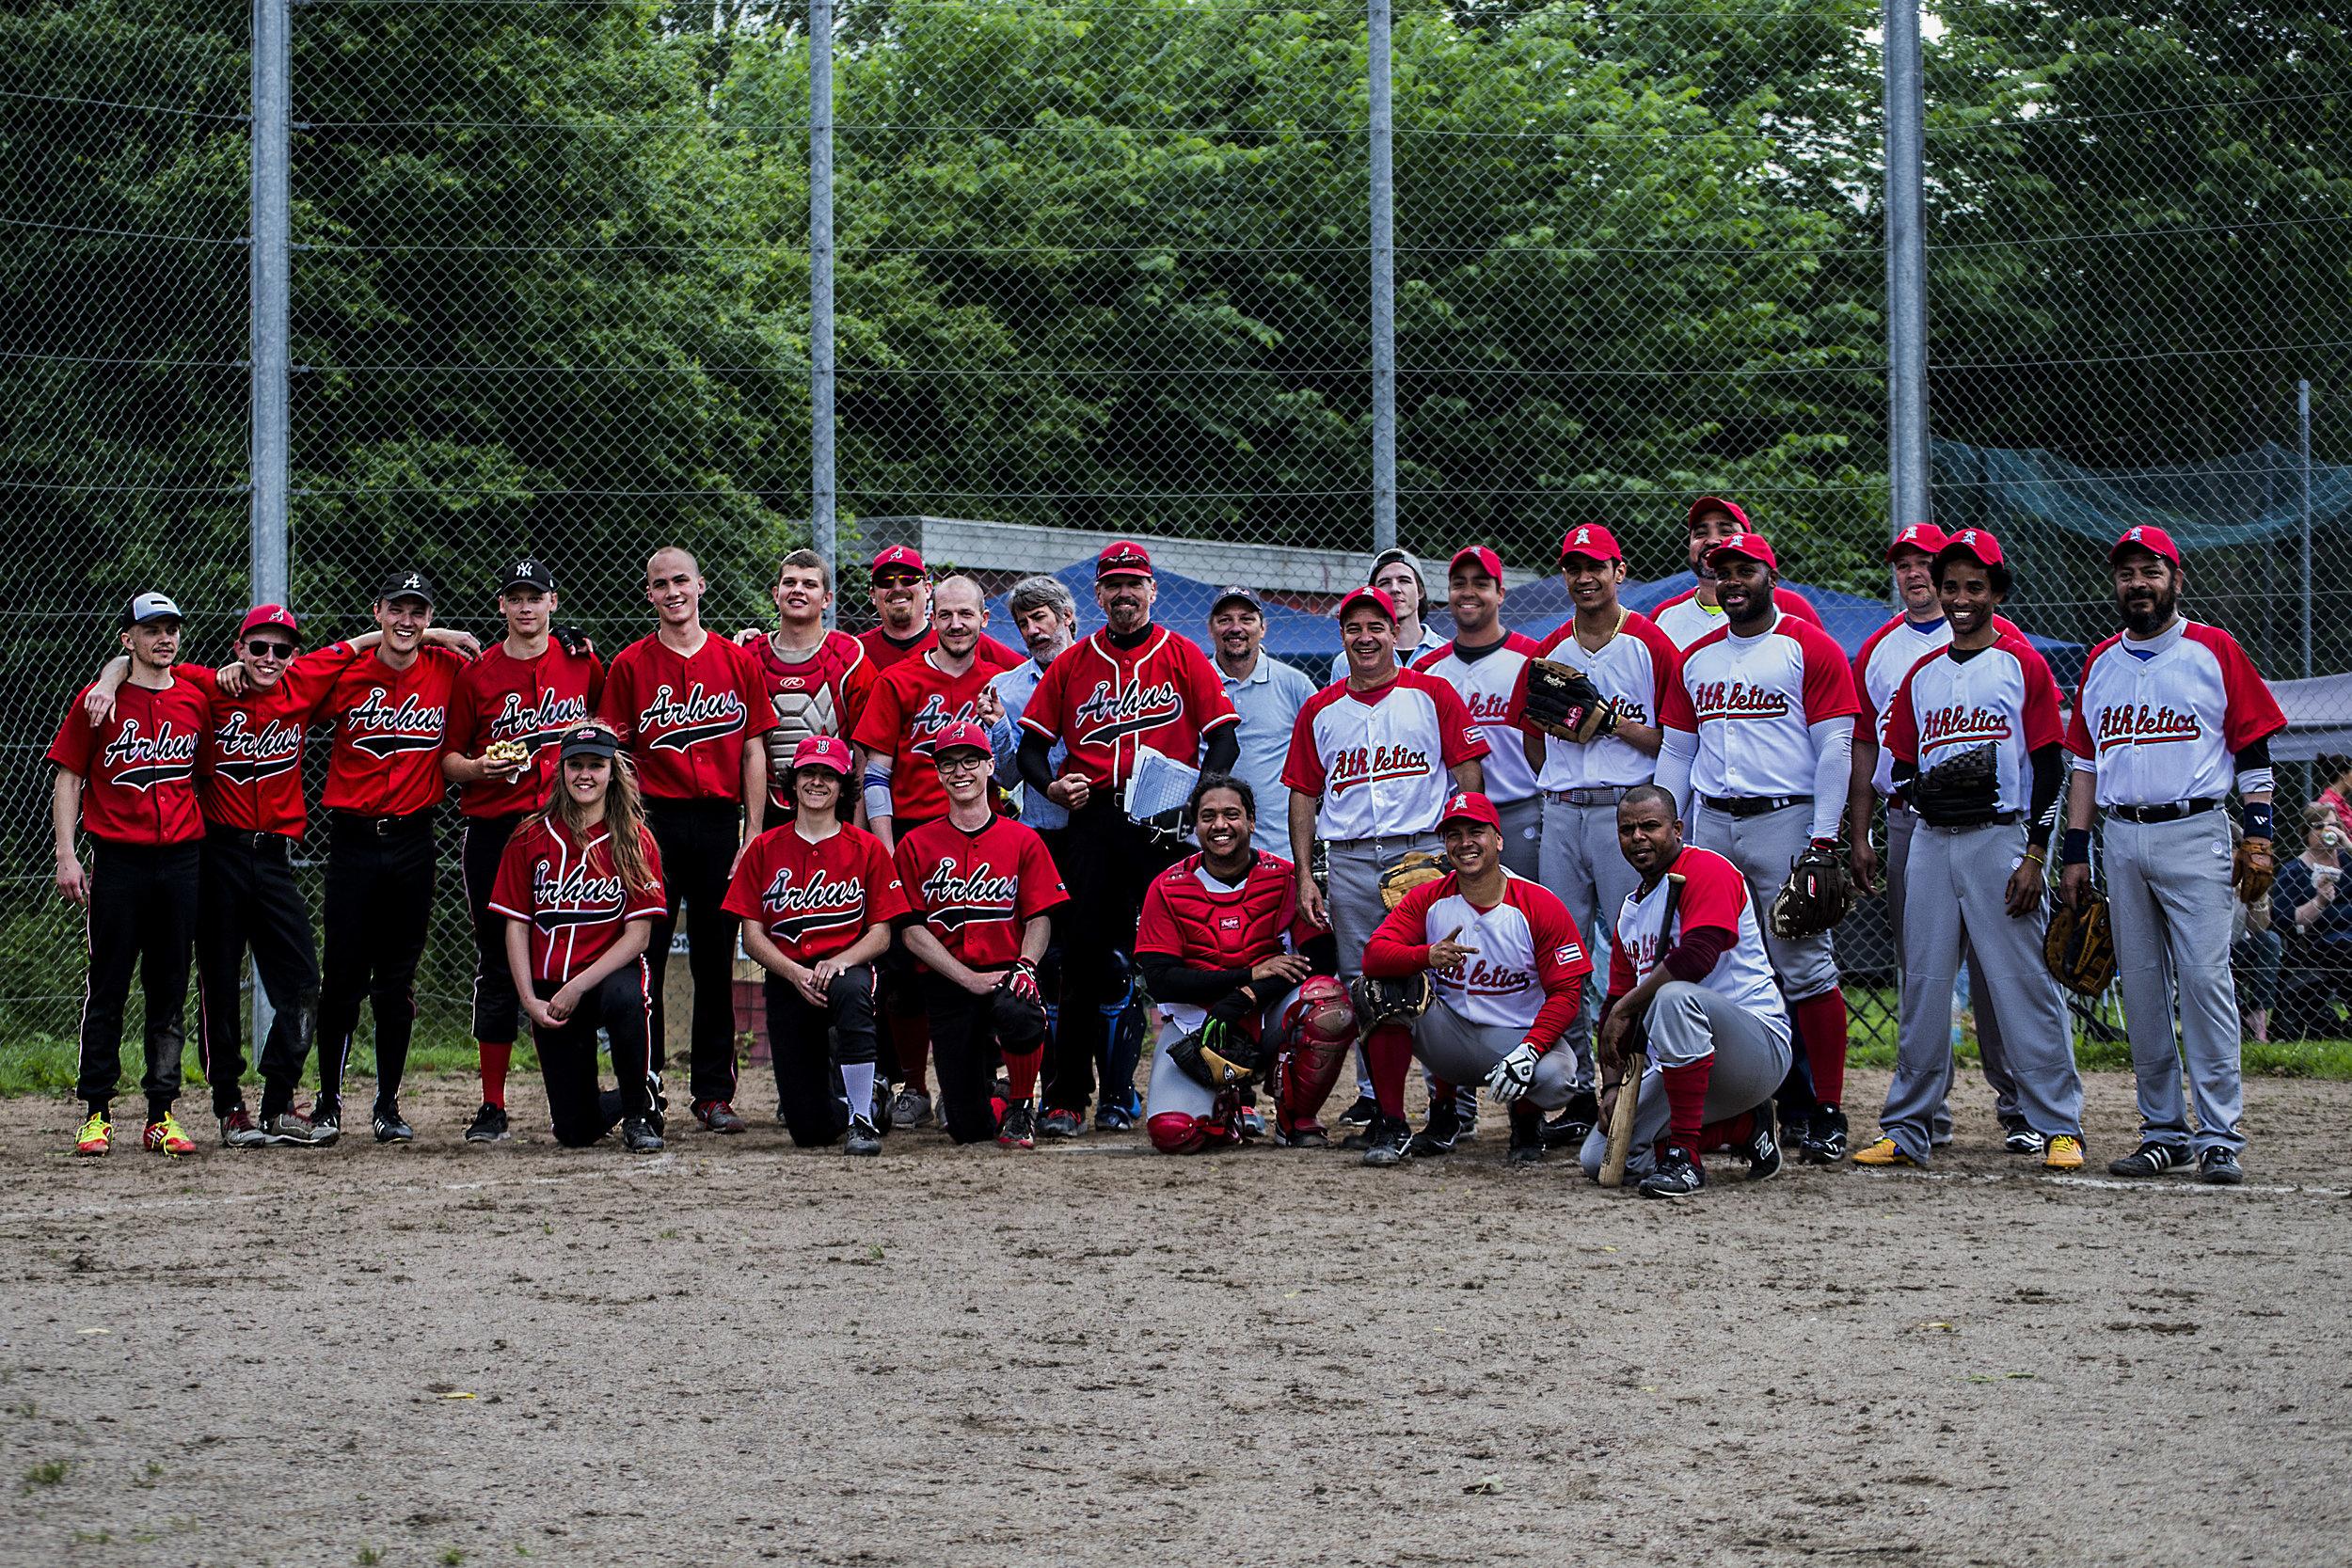 Århus Baseball Softball Klub Baseball Team (Left) and Aarhus Athletics Baseball Club Baseball Team (right), year 2017